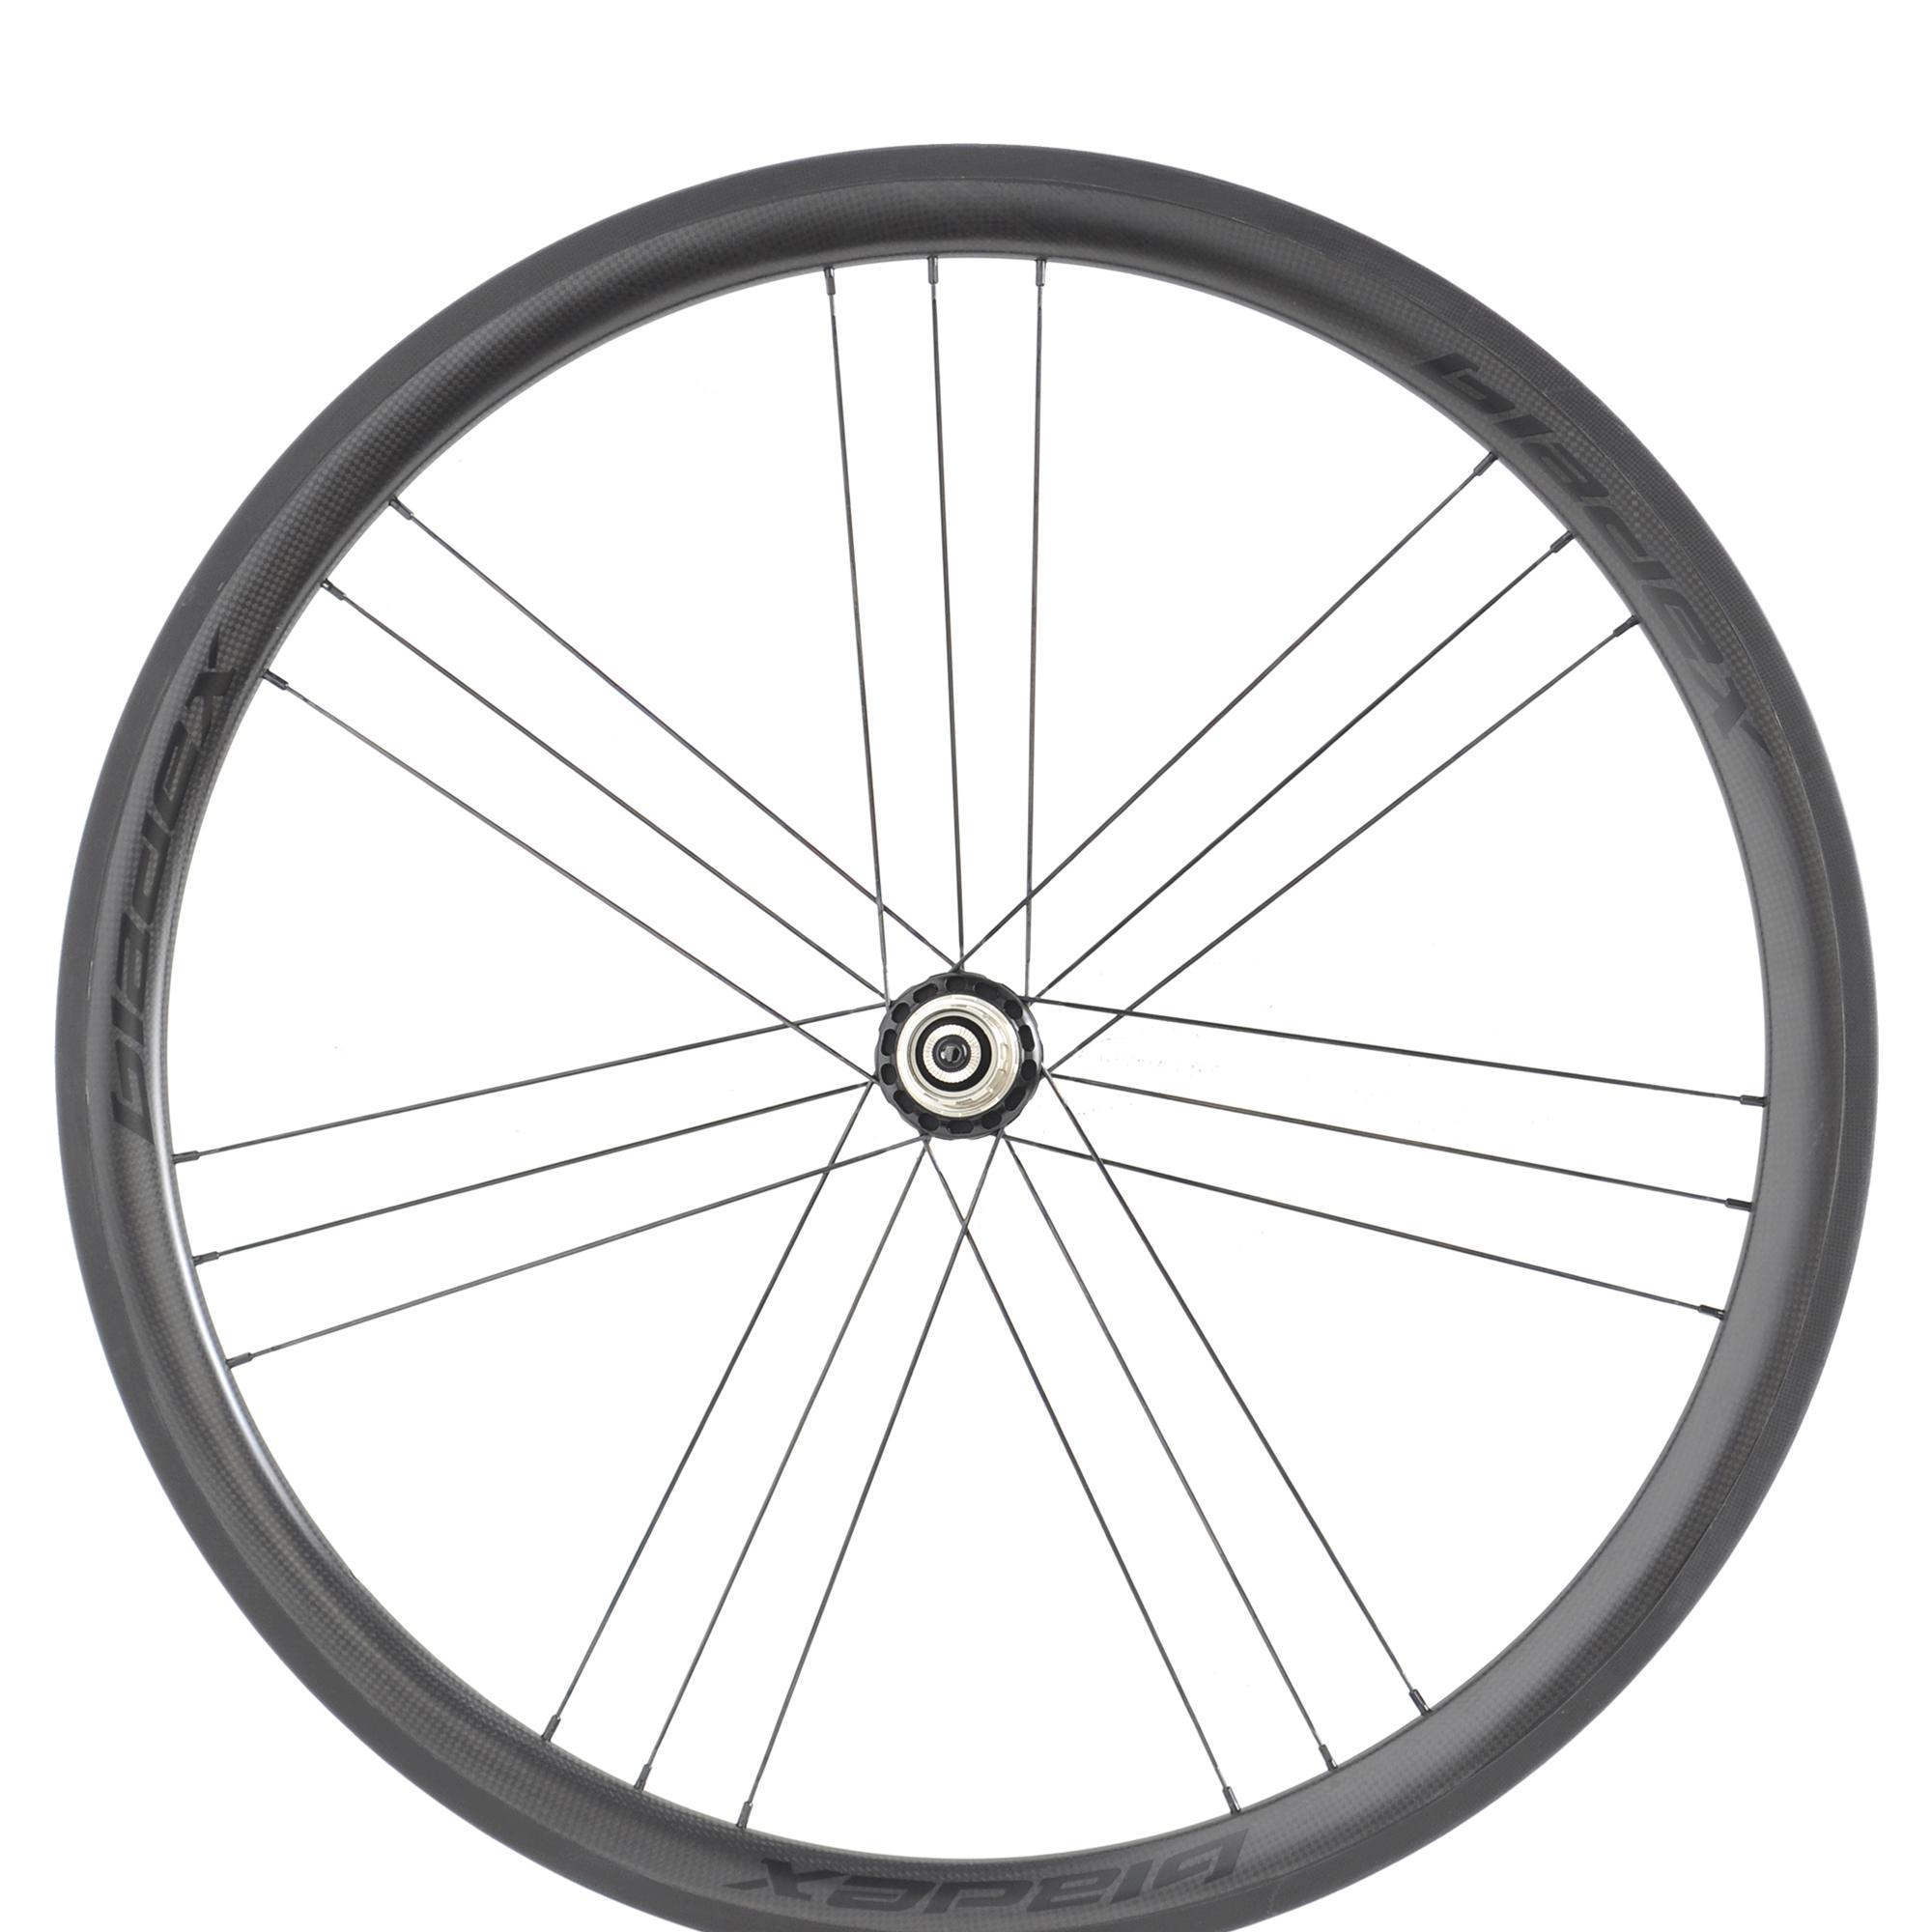 38mm Carbon Wheels